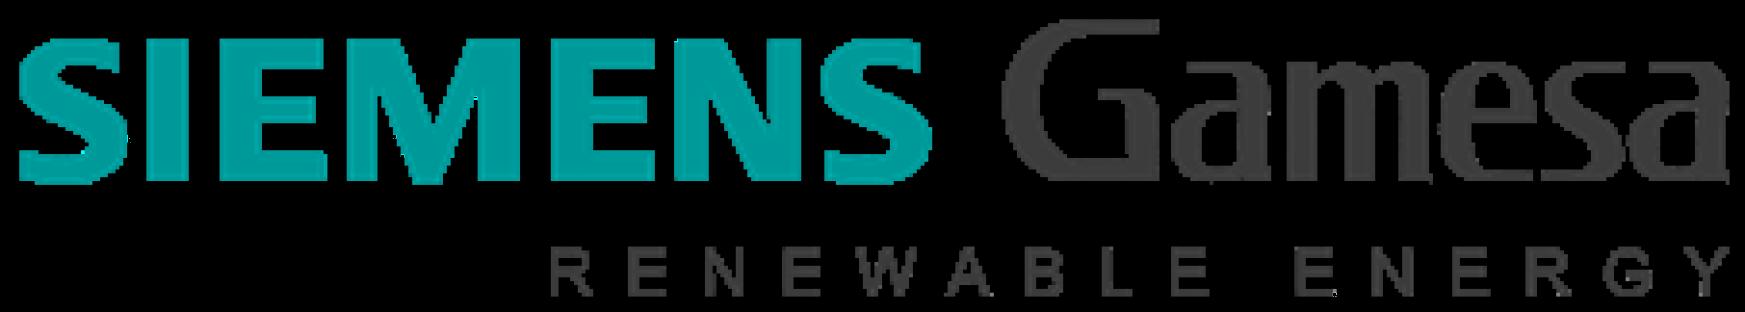 Siemens Gamesa Renewable Energy